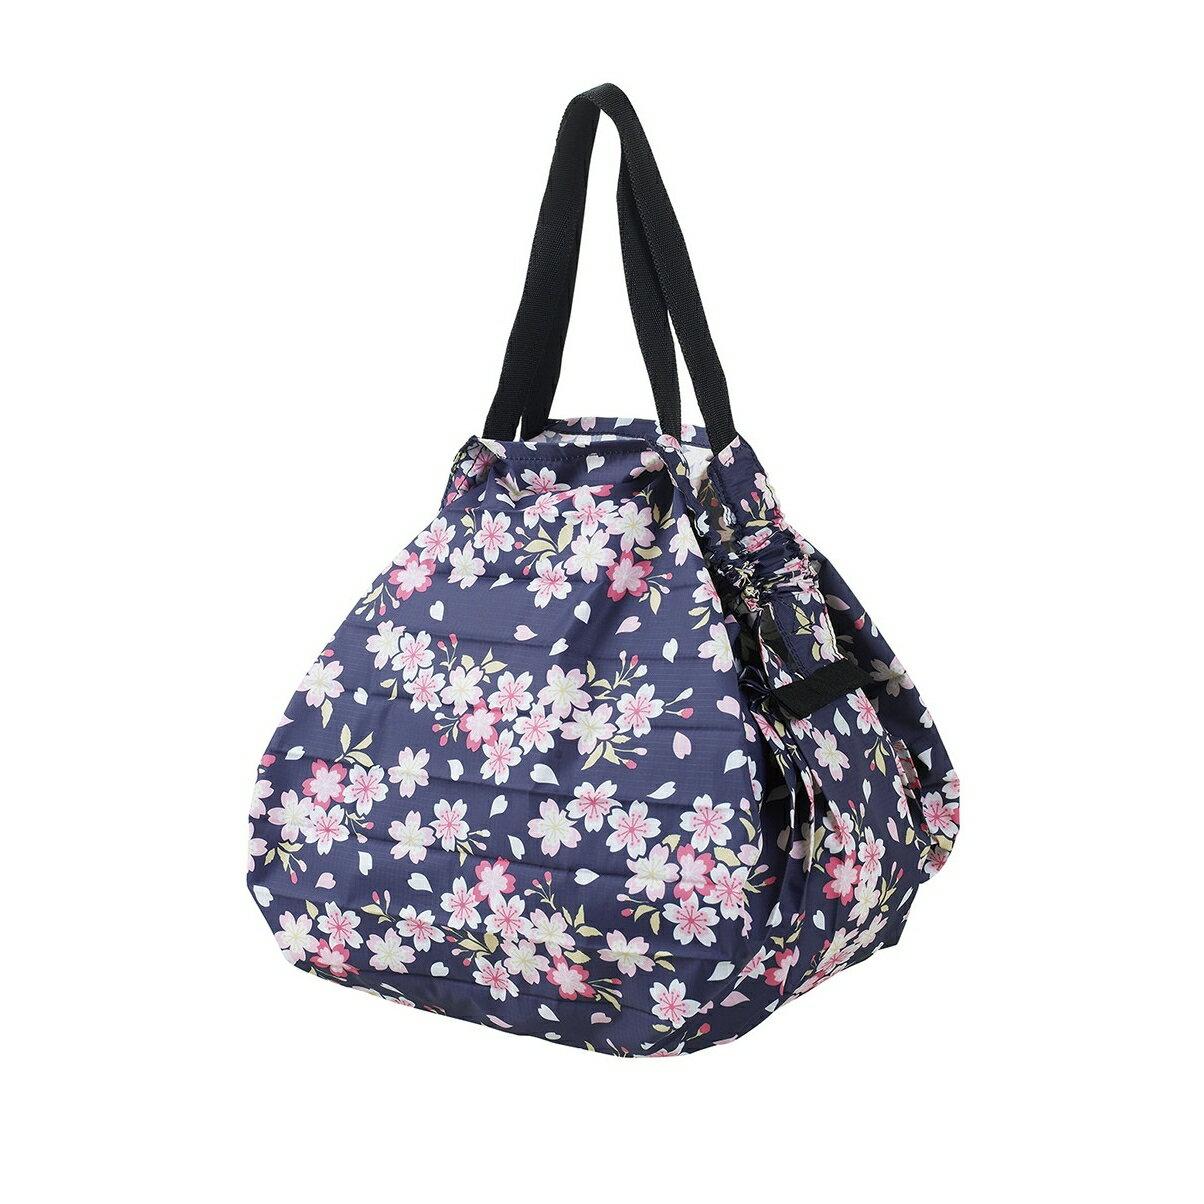 【MARNA】日本 Shupatto輕巧秒收環保袋(M/櫻花)  折疊 大容量 環保袋 購物袋 萬用包 收納